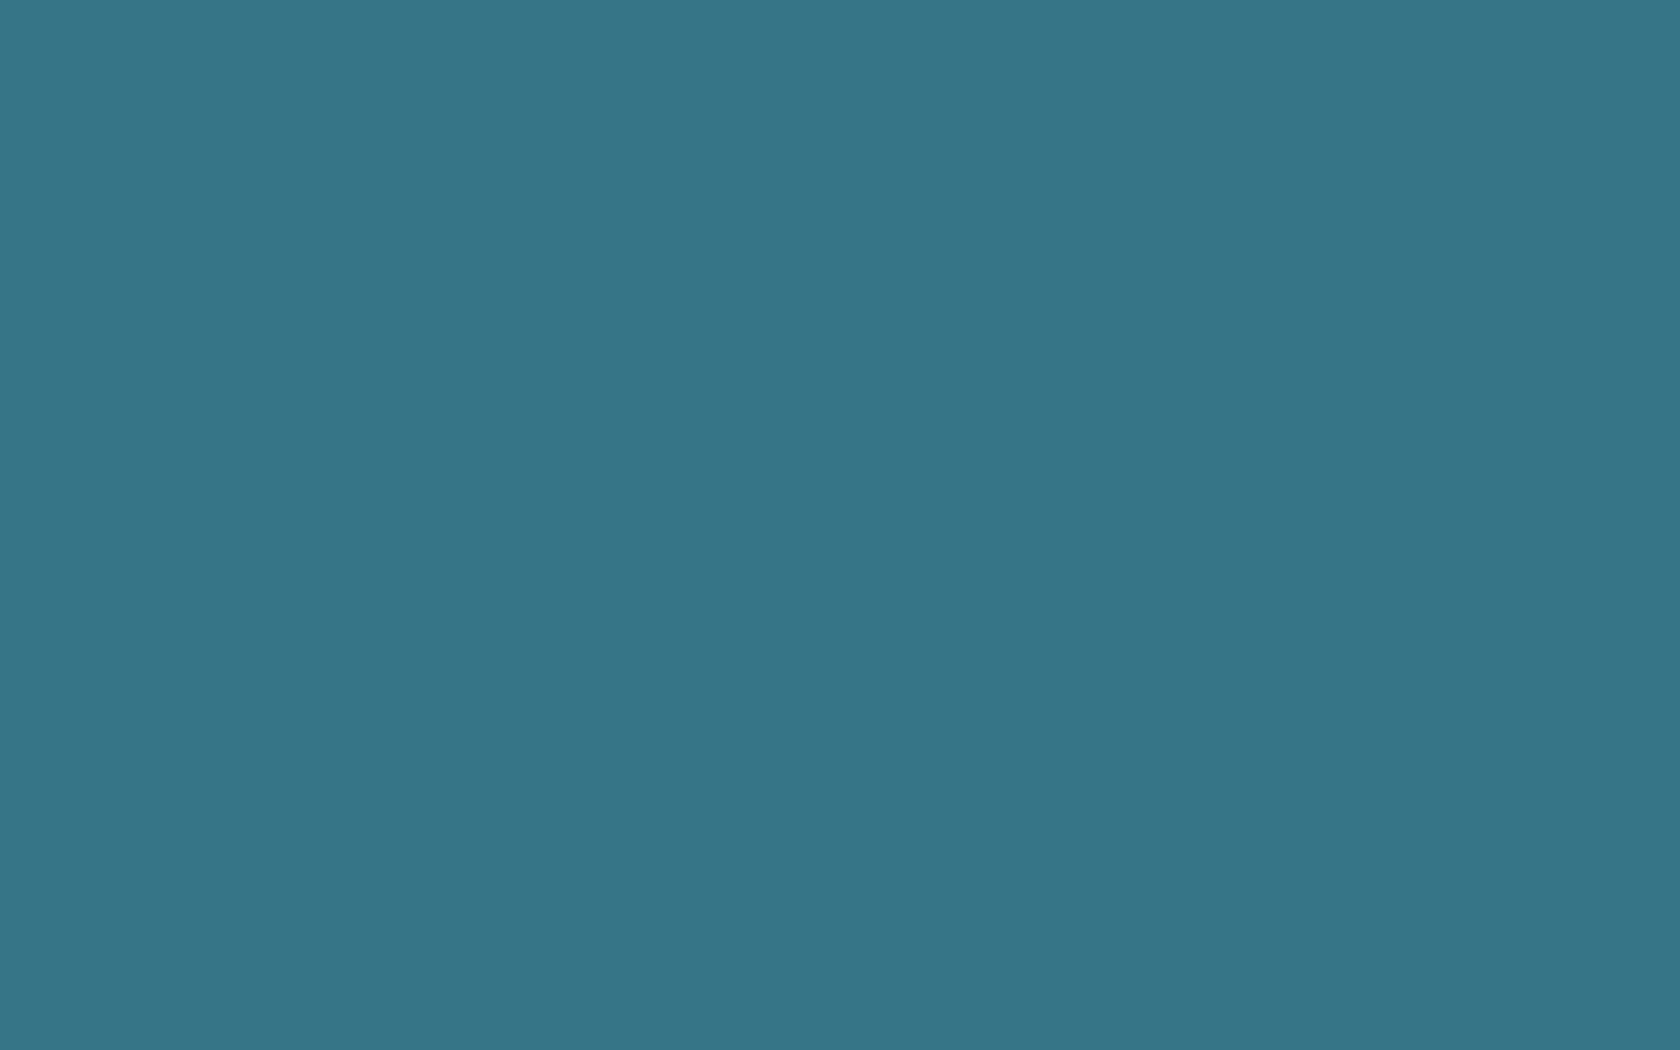 1680x1050 Teal Blue Solid Color Background